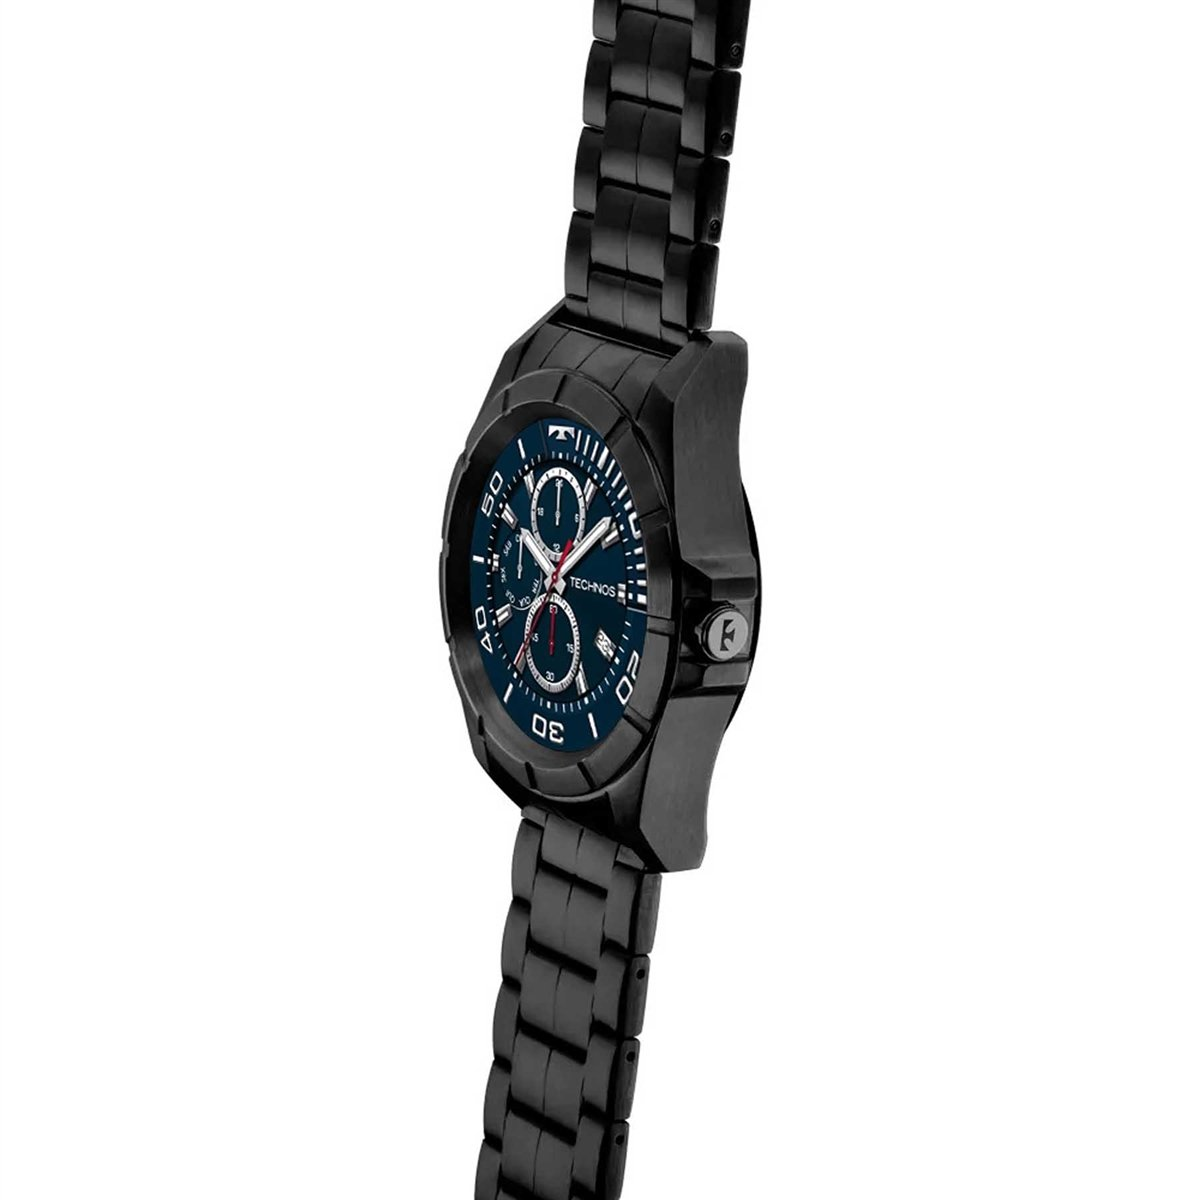 7c90b87a53531 Relógio Masculino Technos Connect Smartwatch SRAC 4P Preto  Amazon.com.br   Eletrônicos